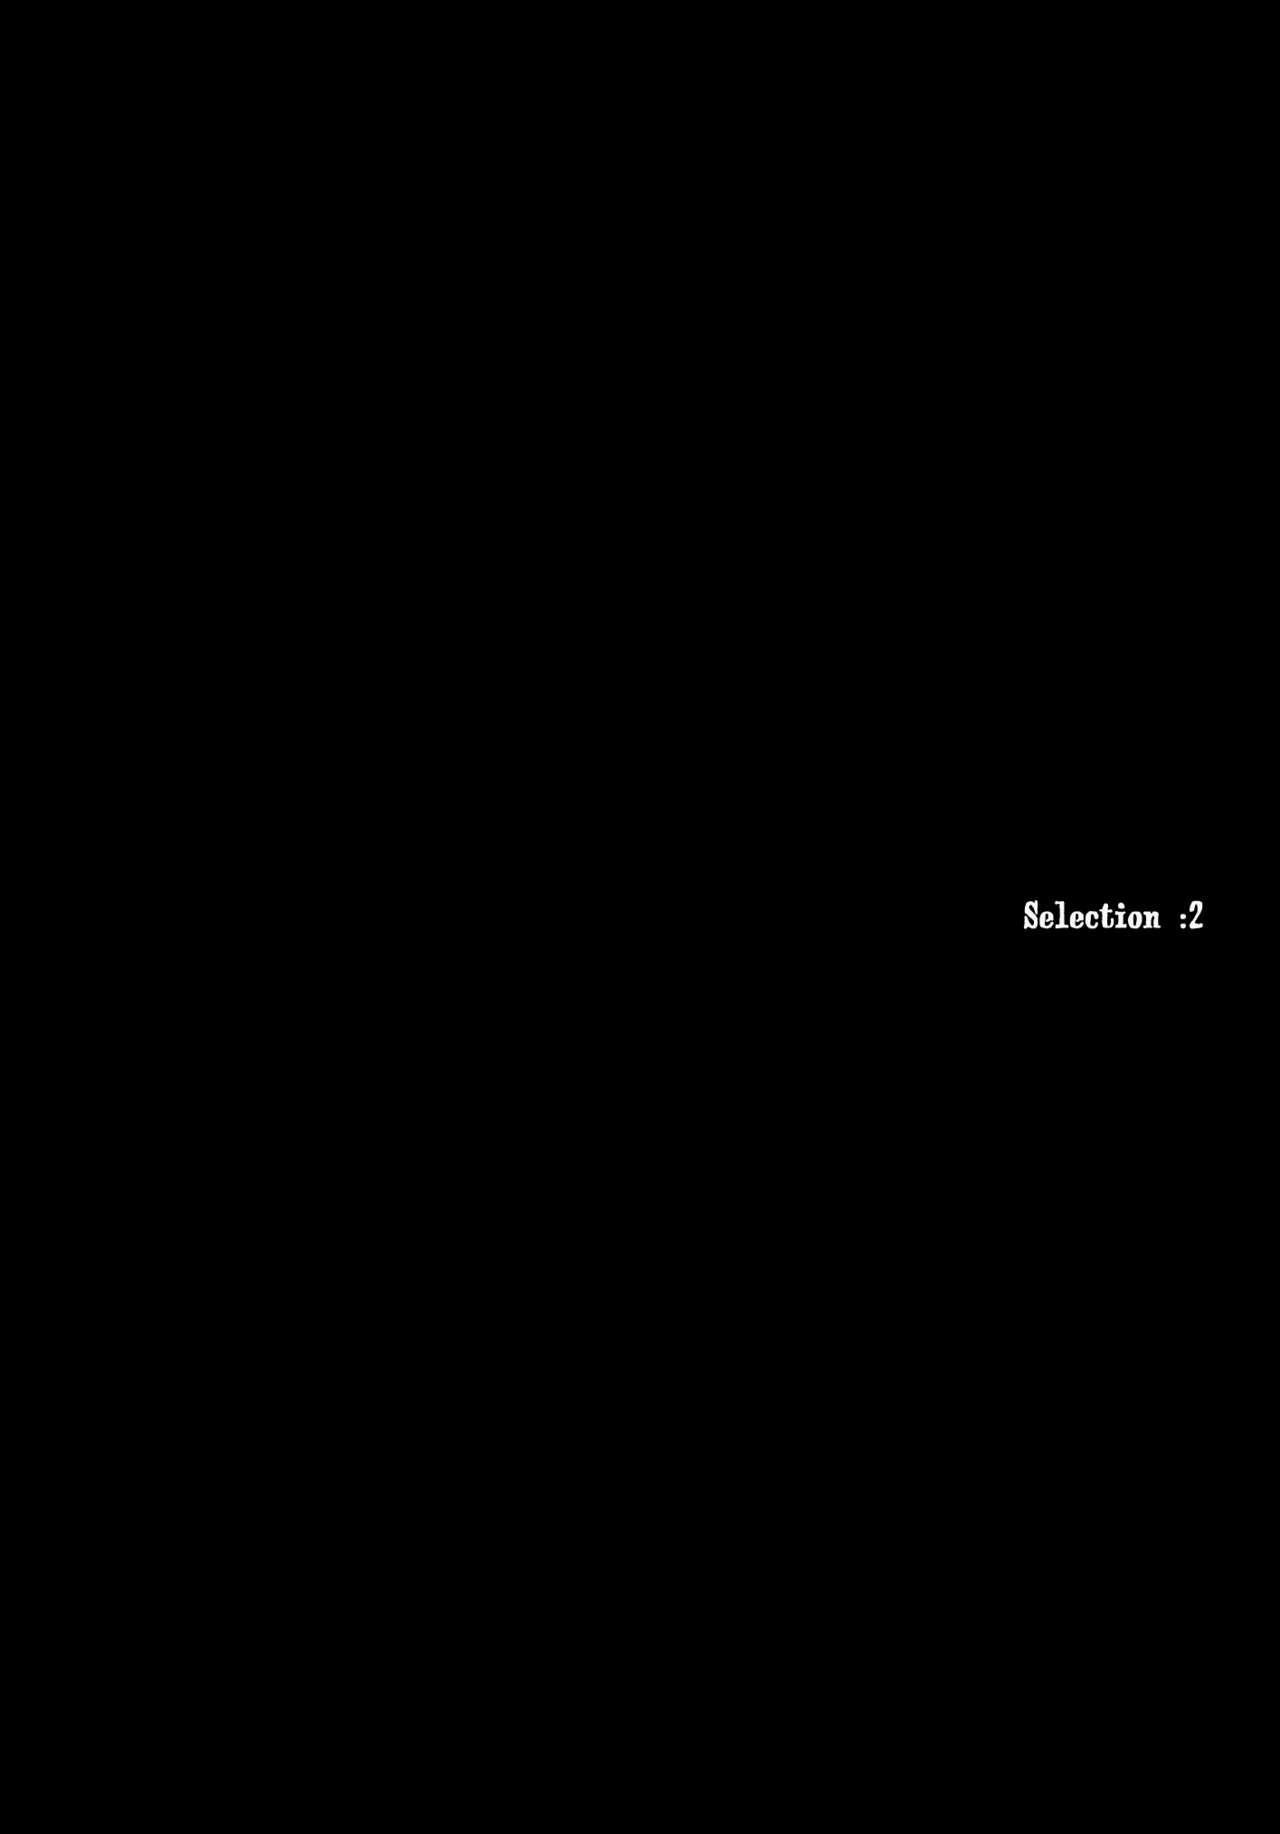 (CR37) [70 Nenshiki Yuukyuu Kikan (Endou Okito)] ORGAN-Tino  01-02[Chinese] [拾荒者汉化组] [Incomplete] 66